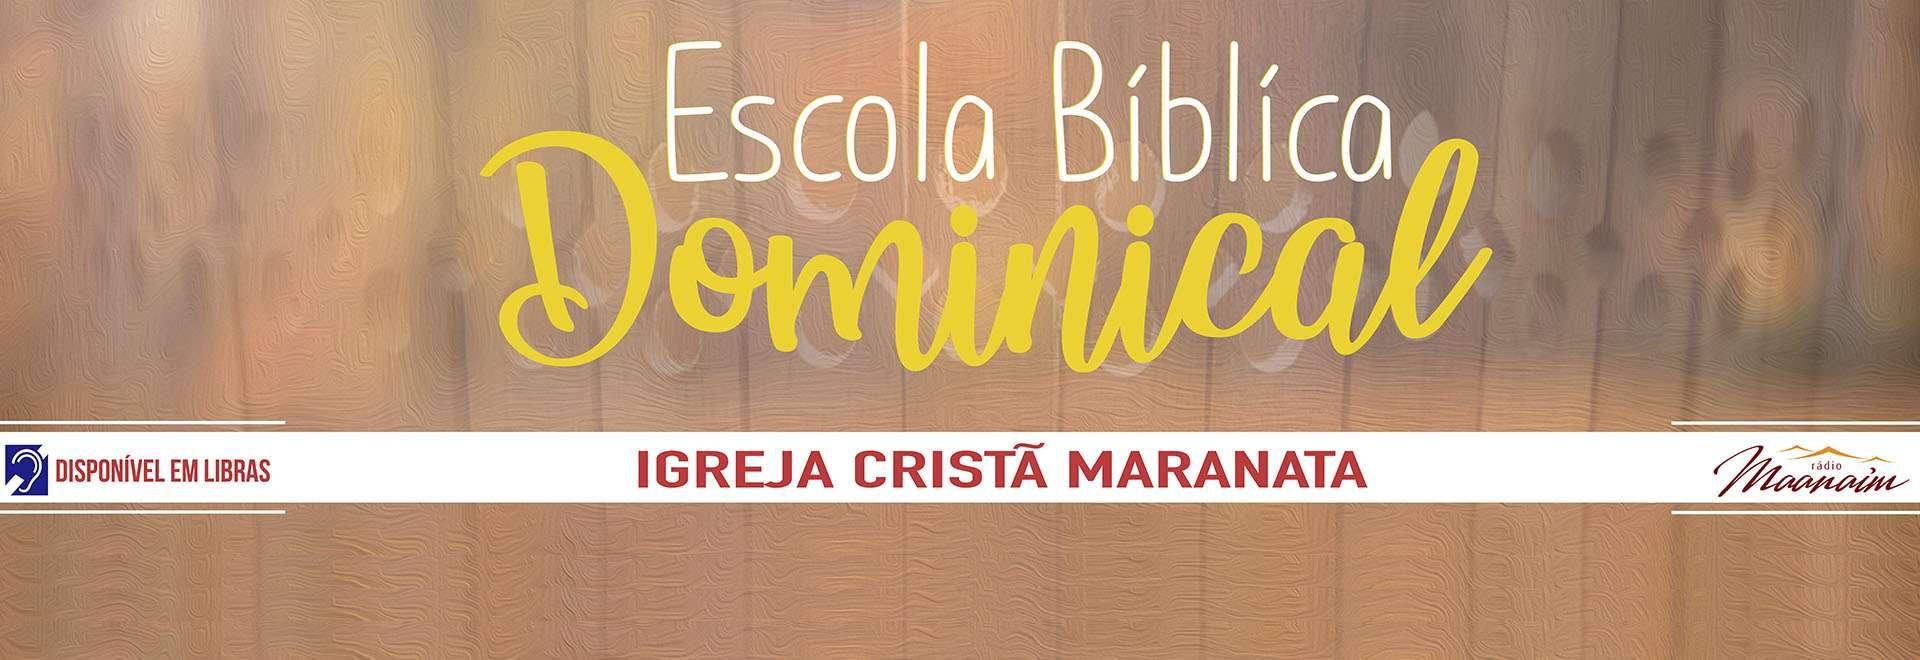 Participações da EBD da Igreja Cristã Maranata - 11/04/2021